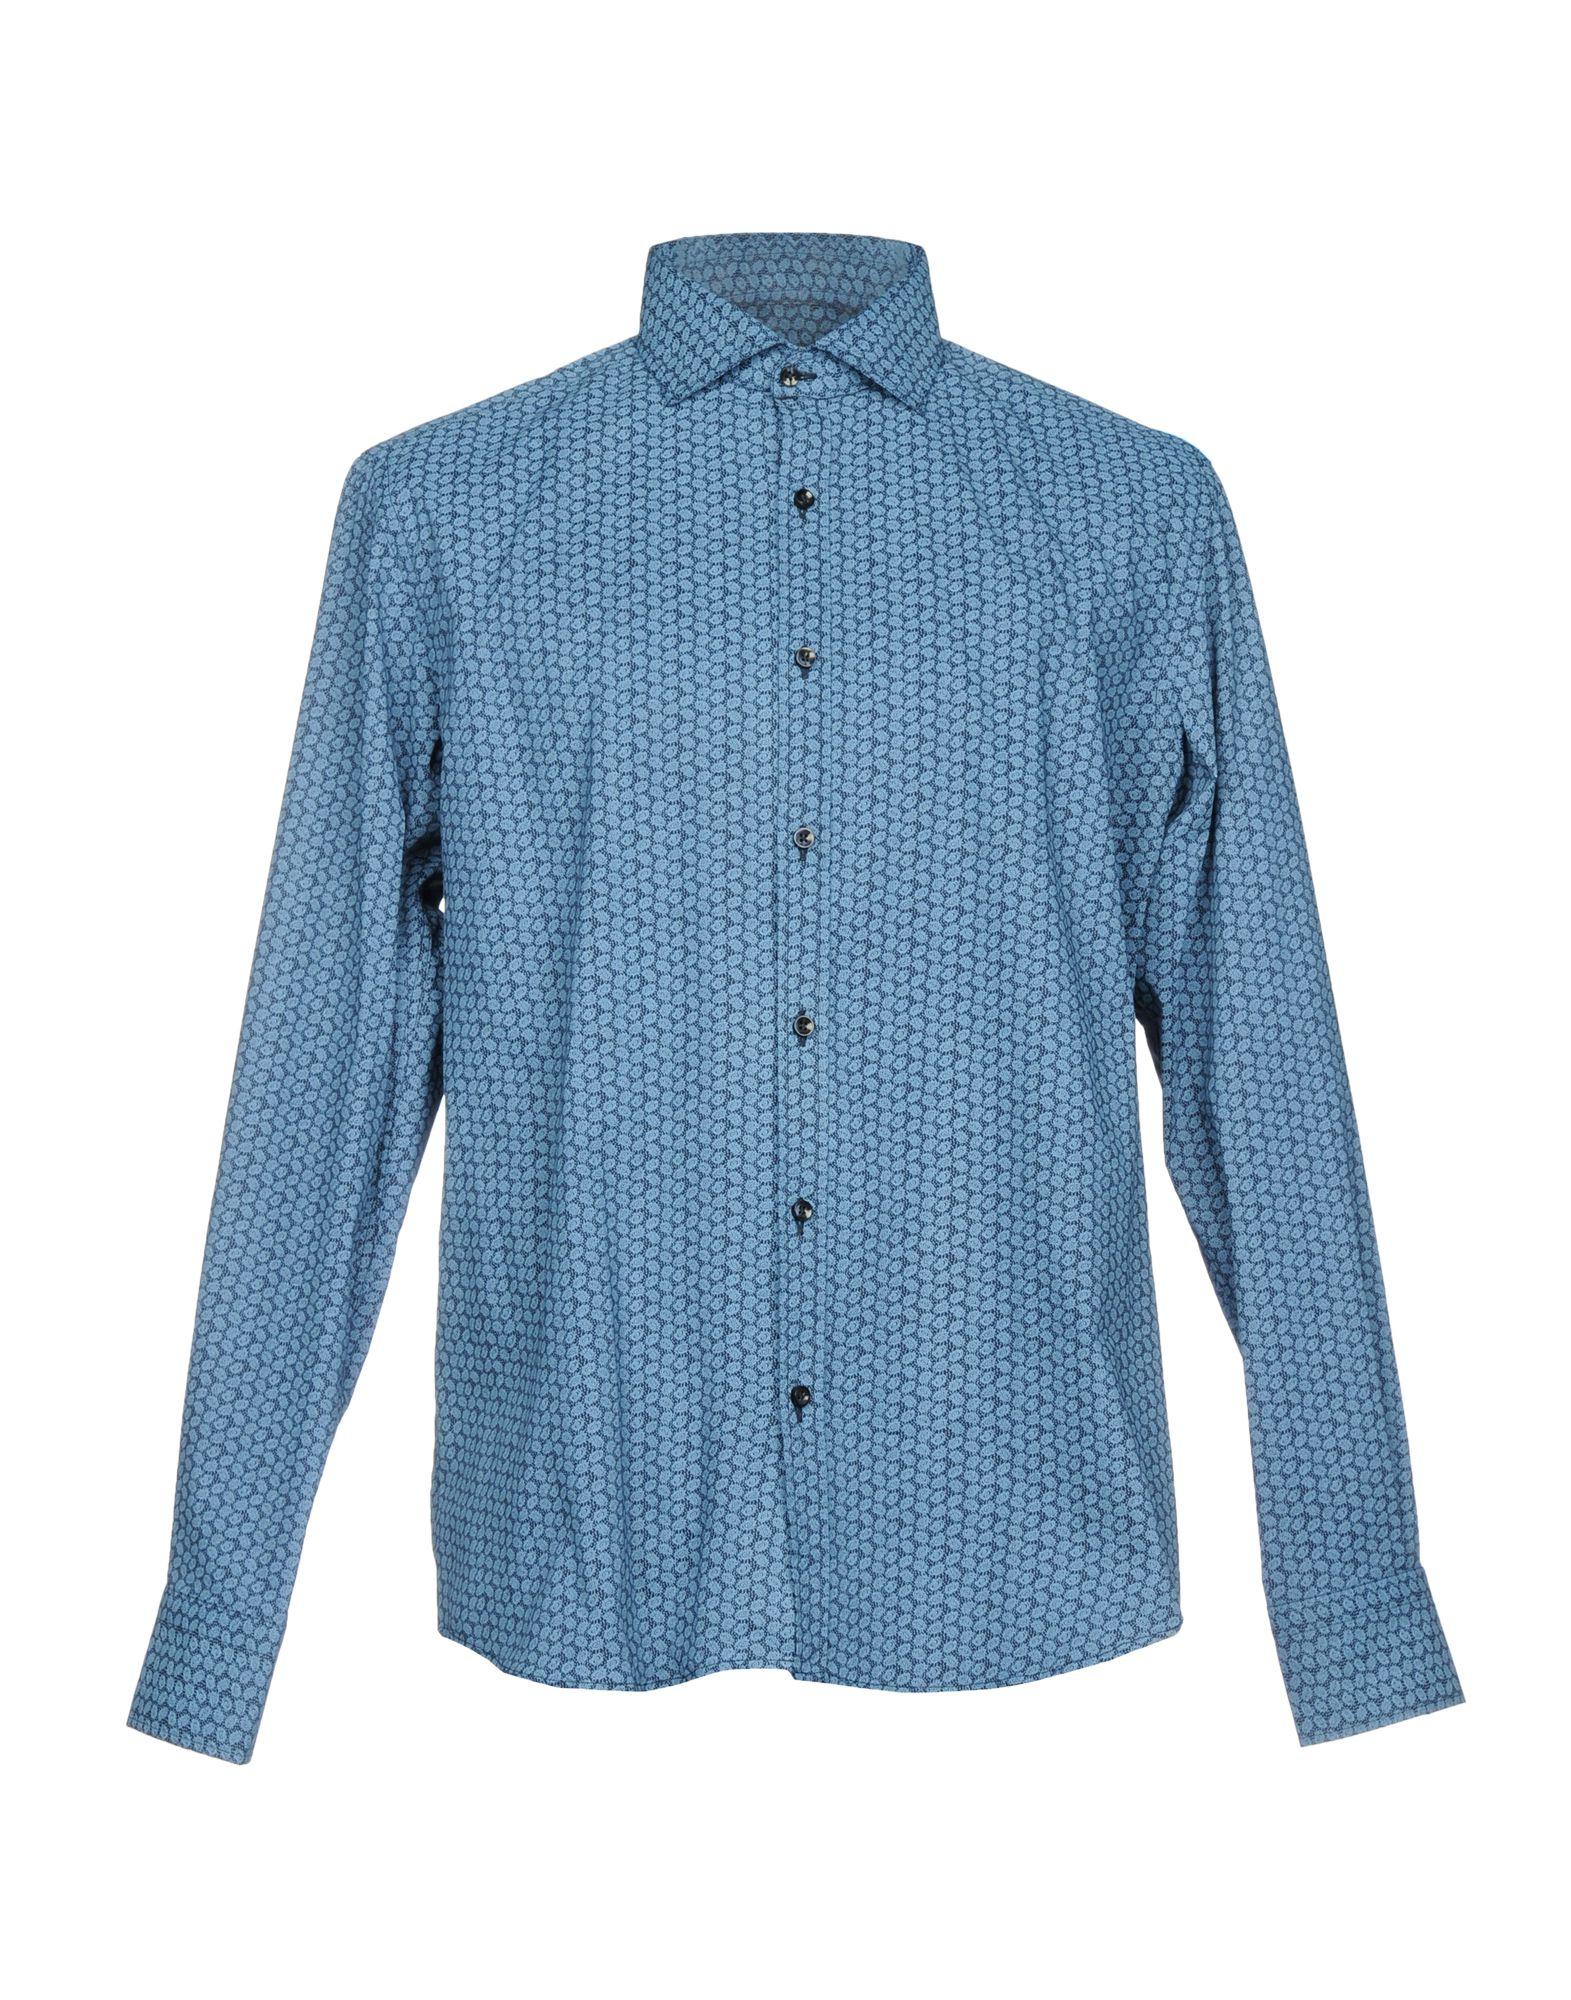 BLUE ISLAND Pубашка одежда для дам thousand island blue qd15sj555